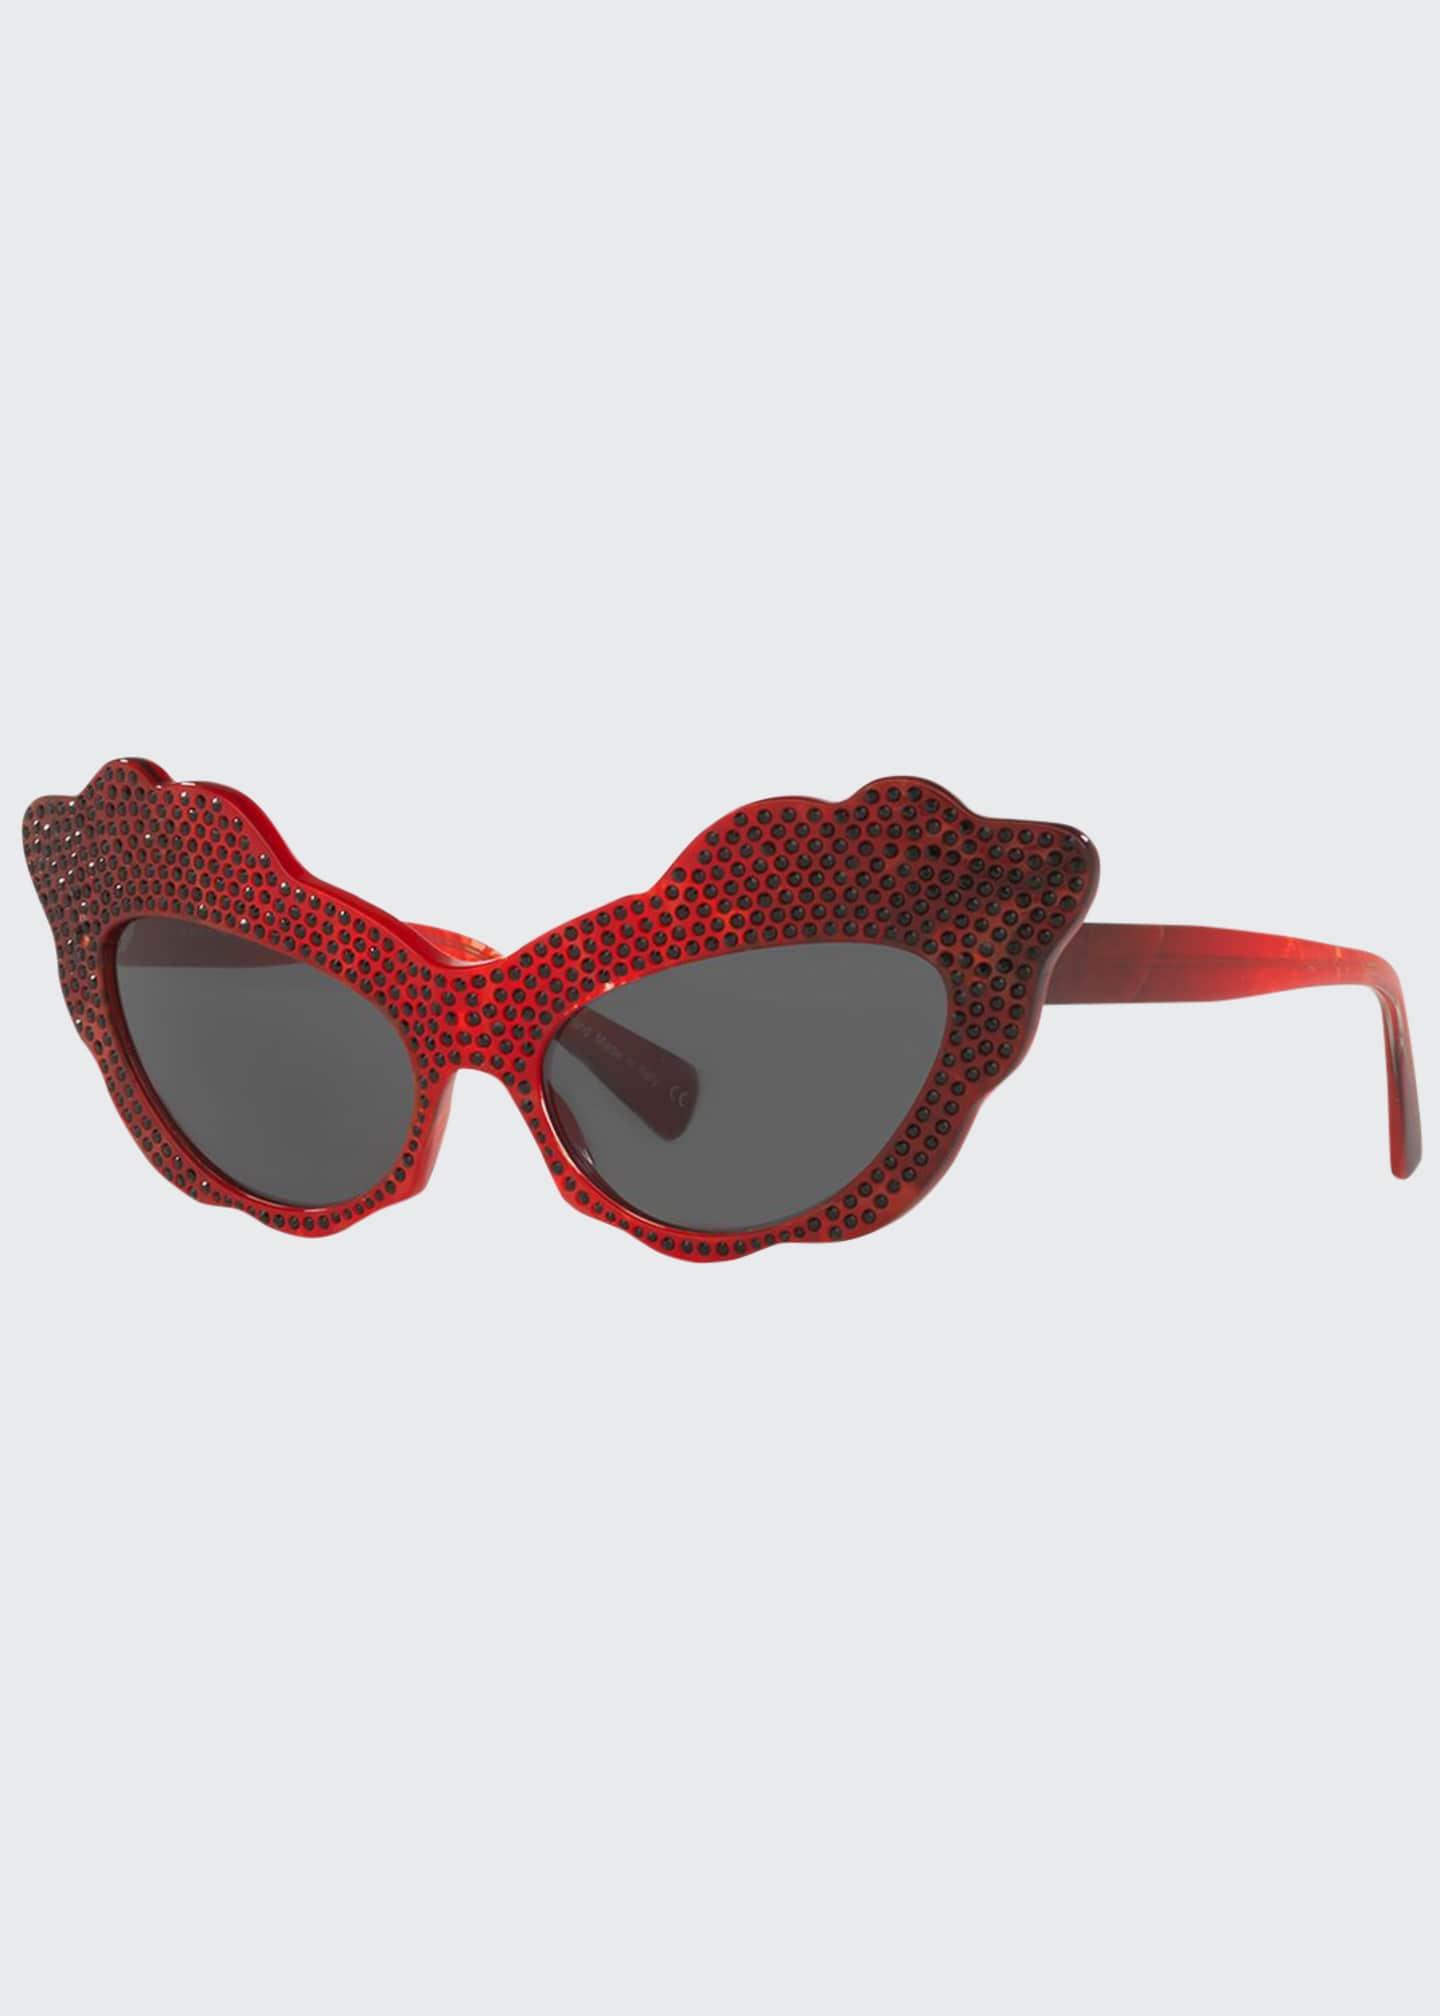 Alain Mikli Aureta Scalloped Cat-Eye Swarovski Crystal Sunglasses